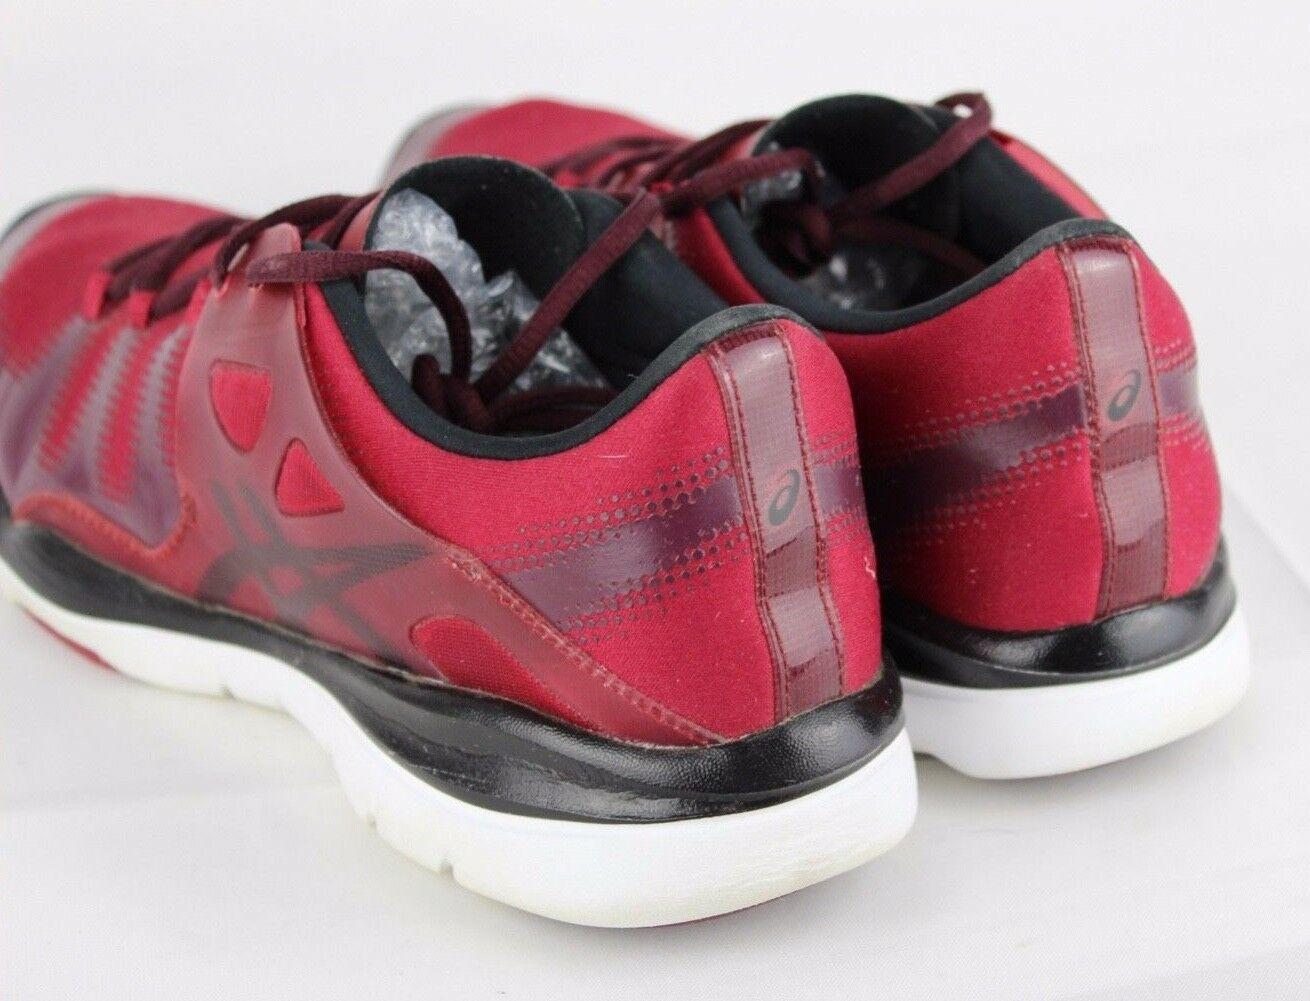 Asics Gel Passform Vida Damen Schuhe Rot Laufen Training Sneakers Schnürsenkel